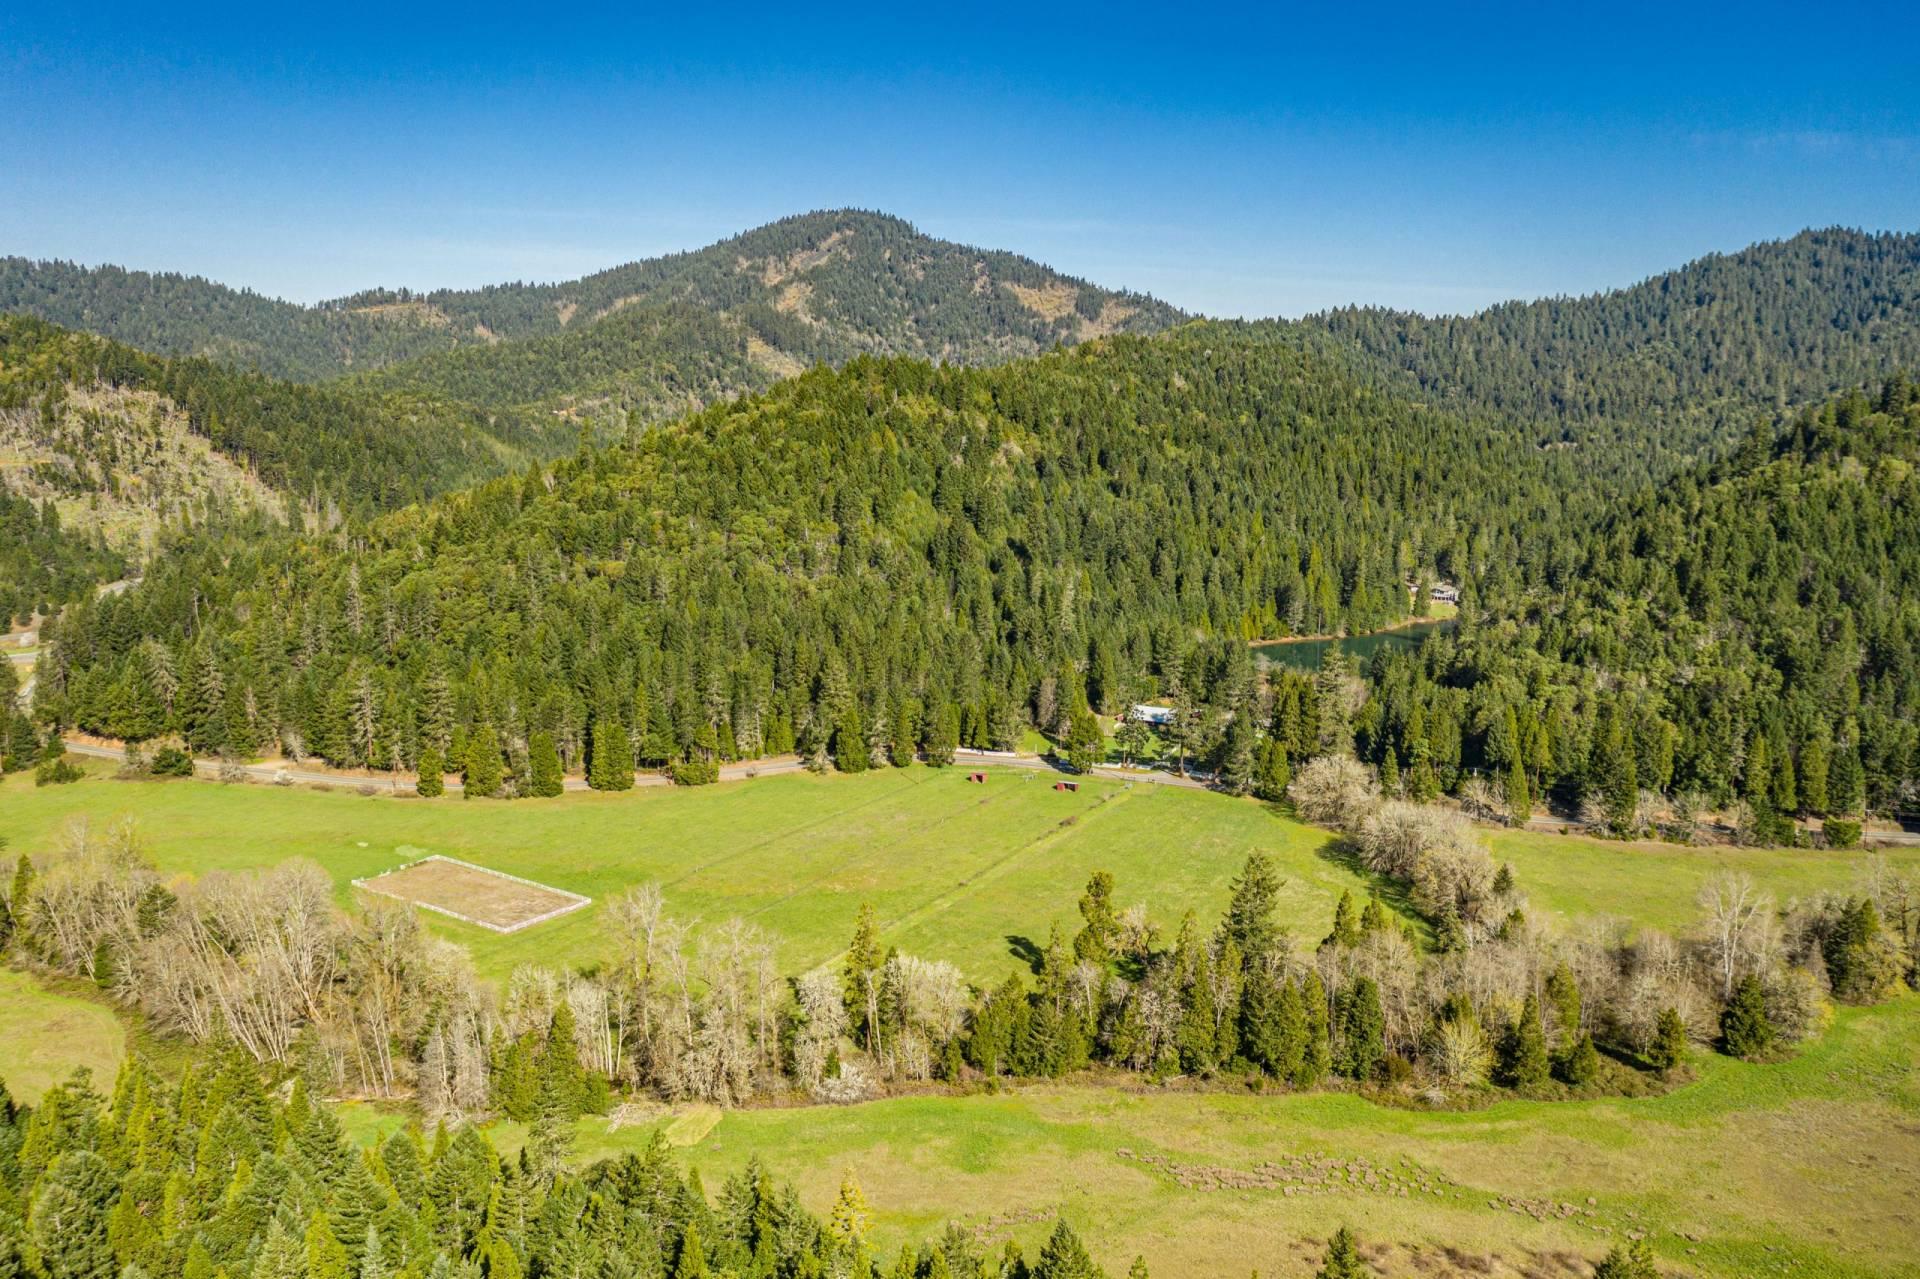 Sourdough Gulch Ranch